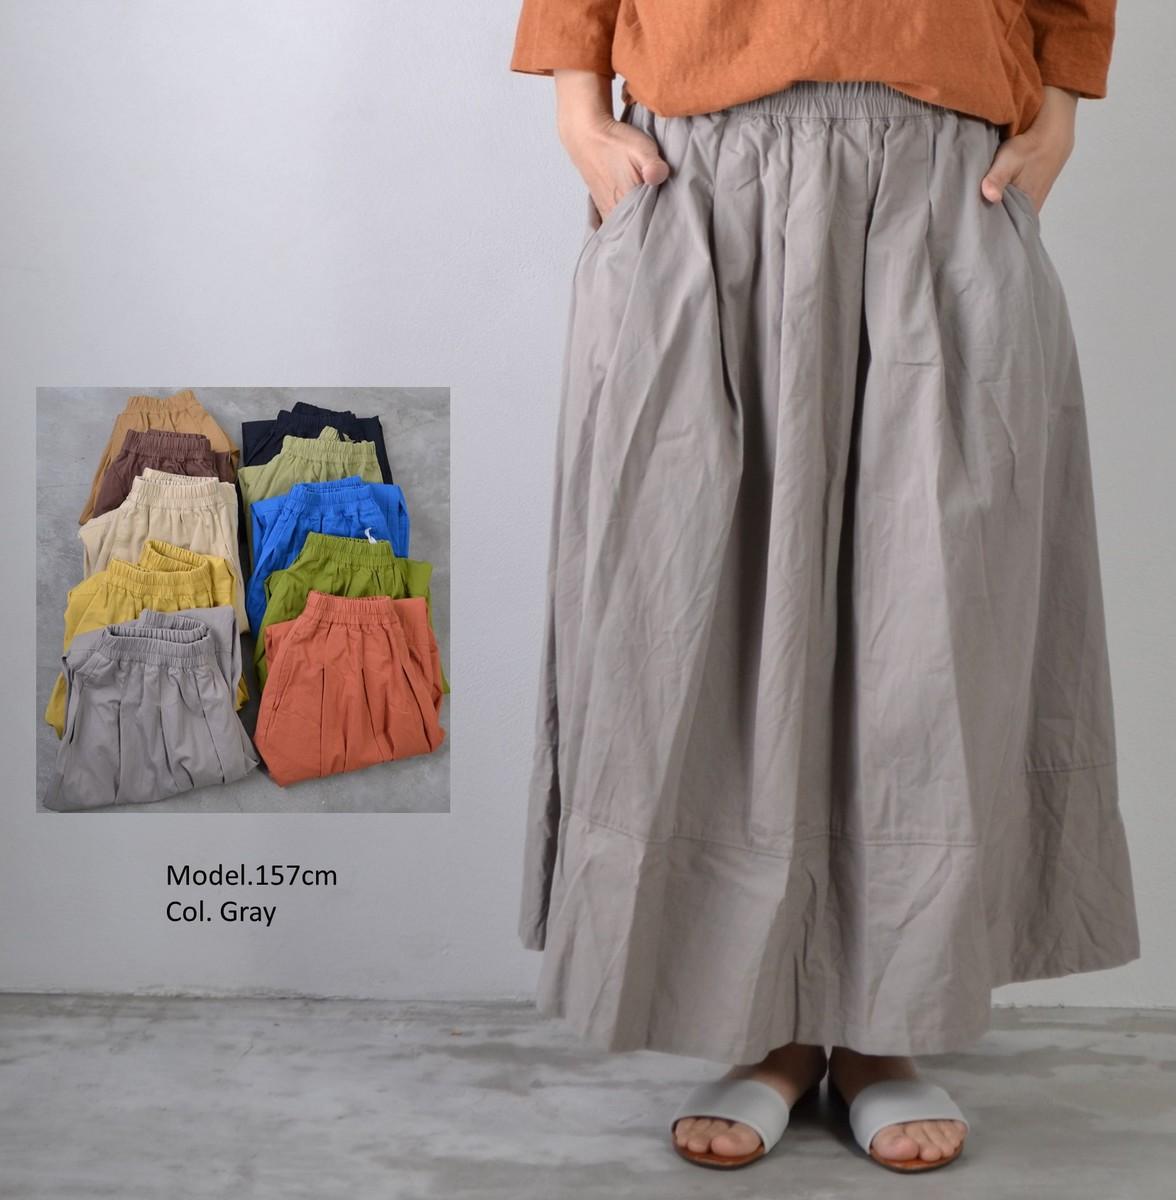 chloro sister クロロシスター バーバリー 裾切替 ロング スカート CS3205 全10色 日本製 ボトム スカート ロングスカート 送料無料